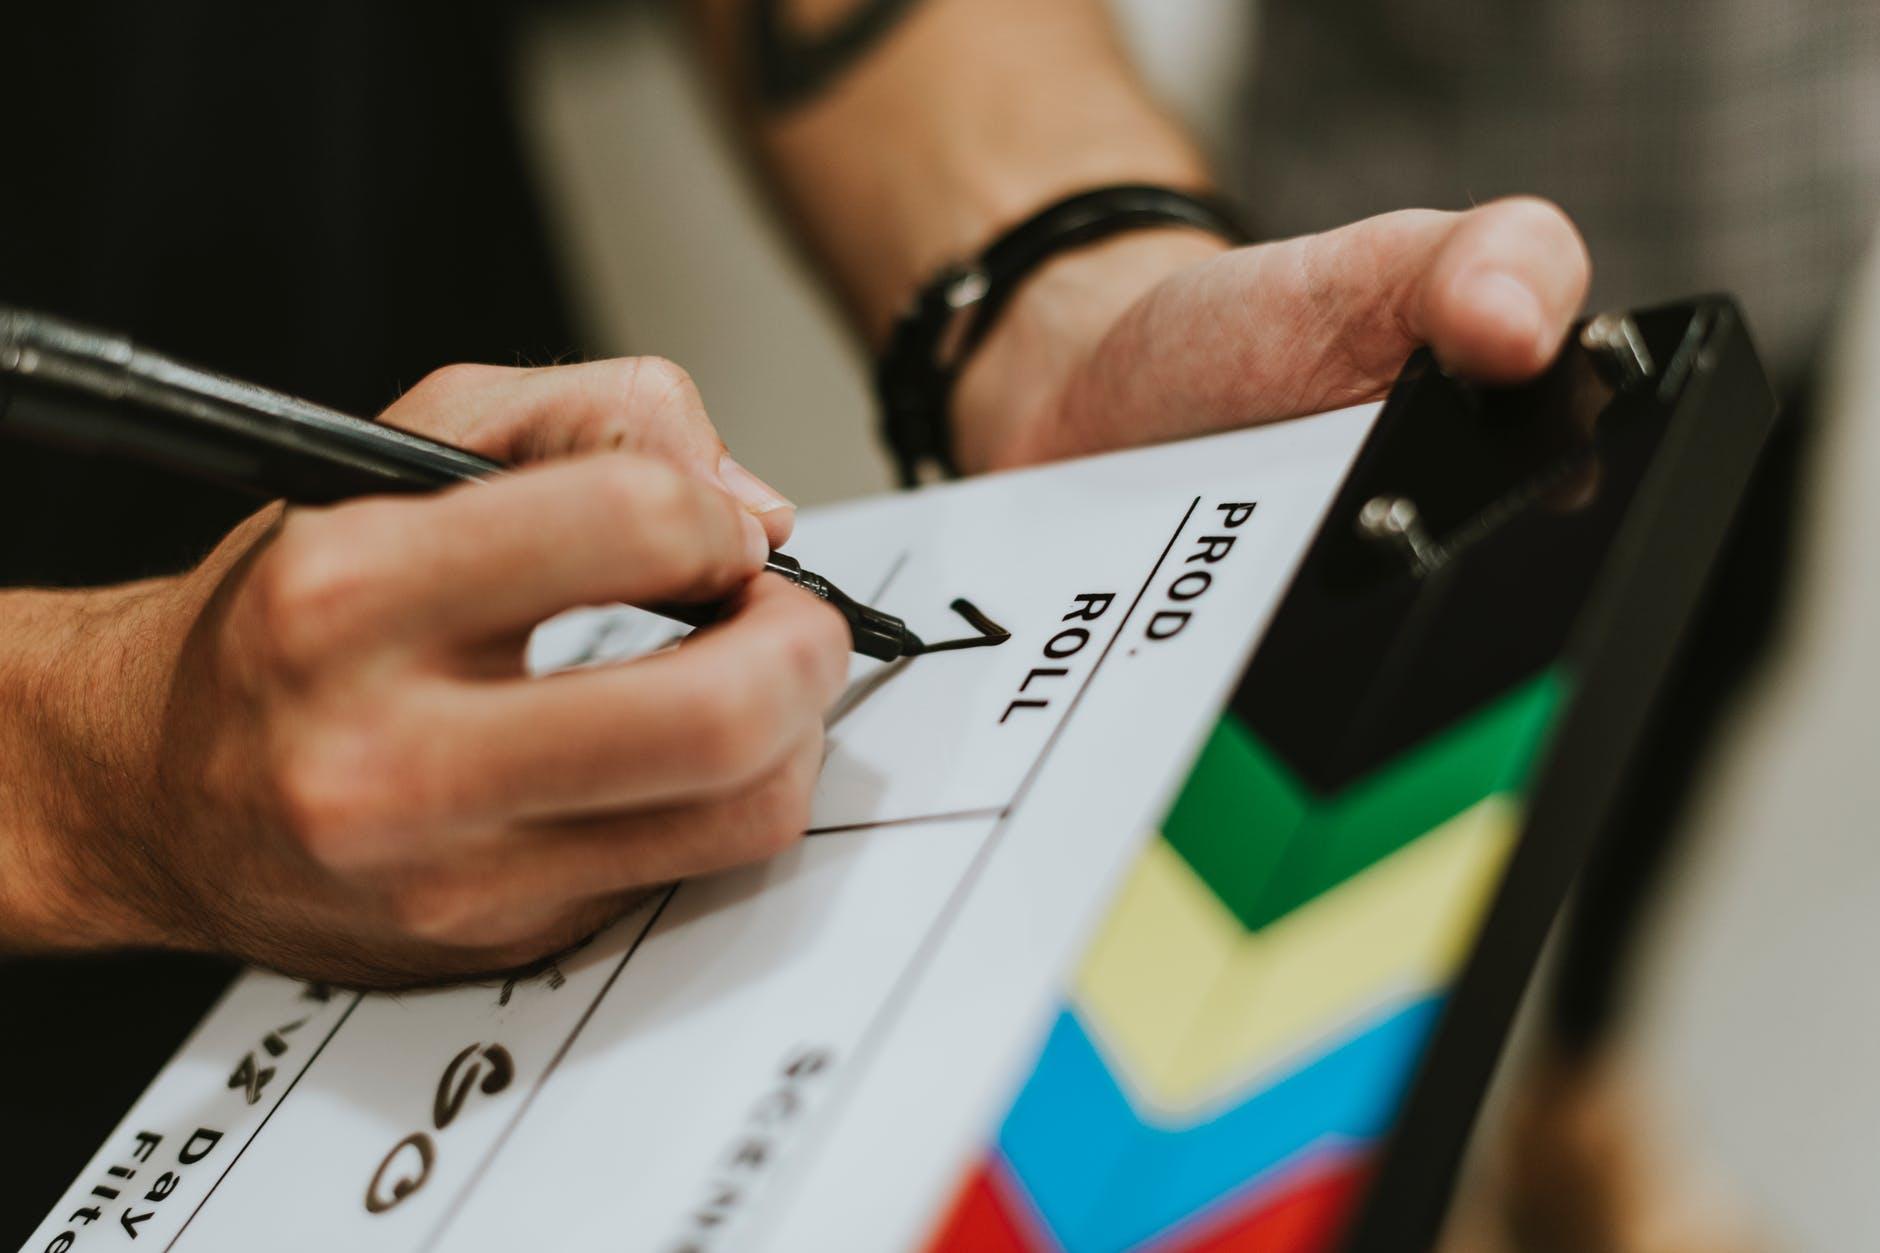 Clapperboard, slate, 1st AC, TV Studio production.